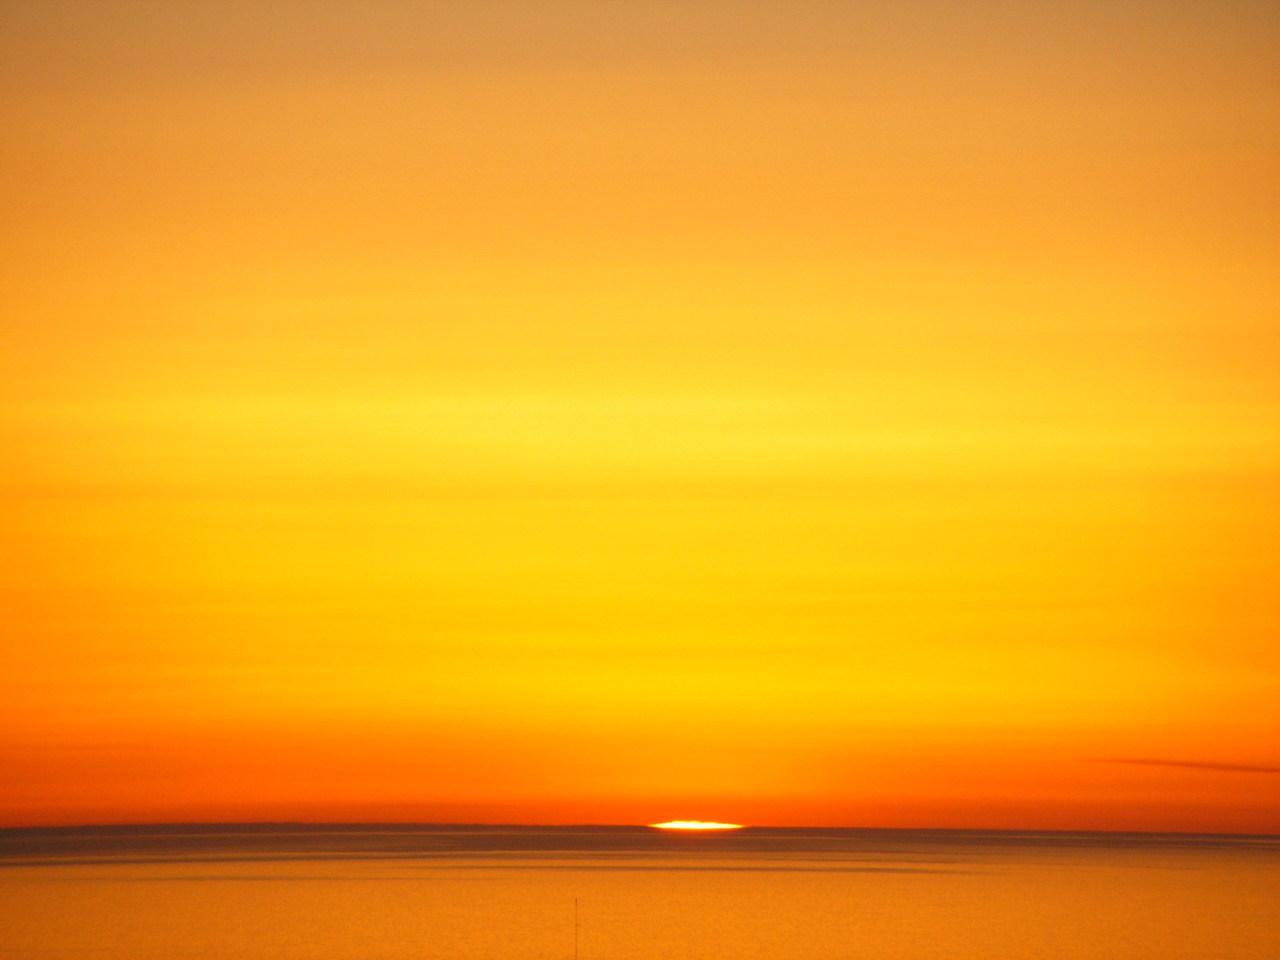 good-morning-mr-sun-1396751-1280x960.jpg